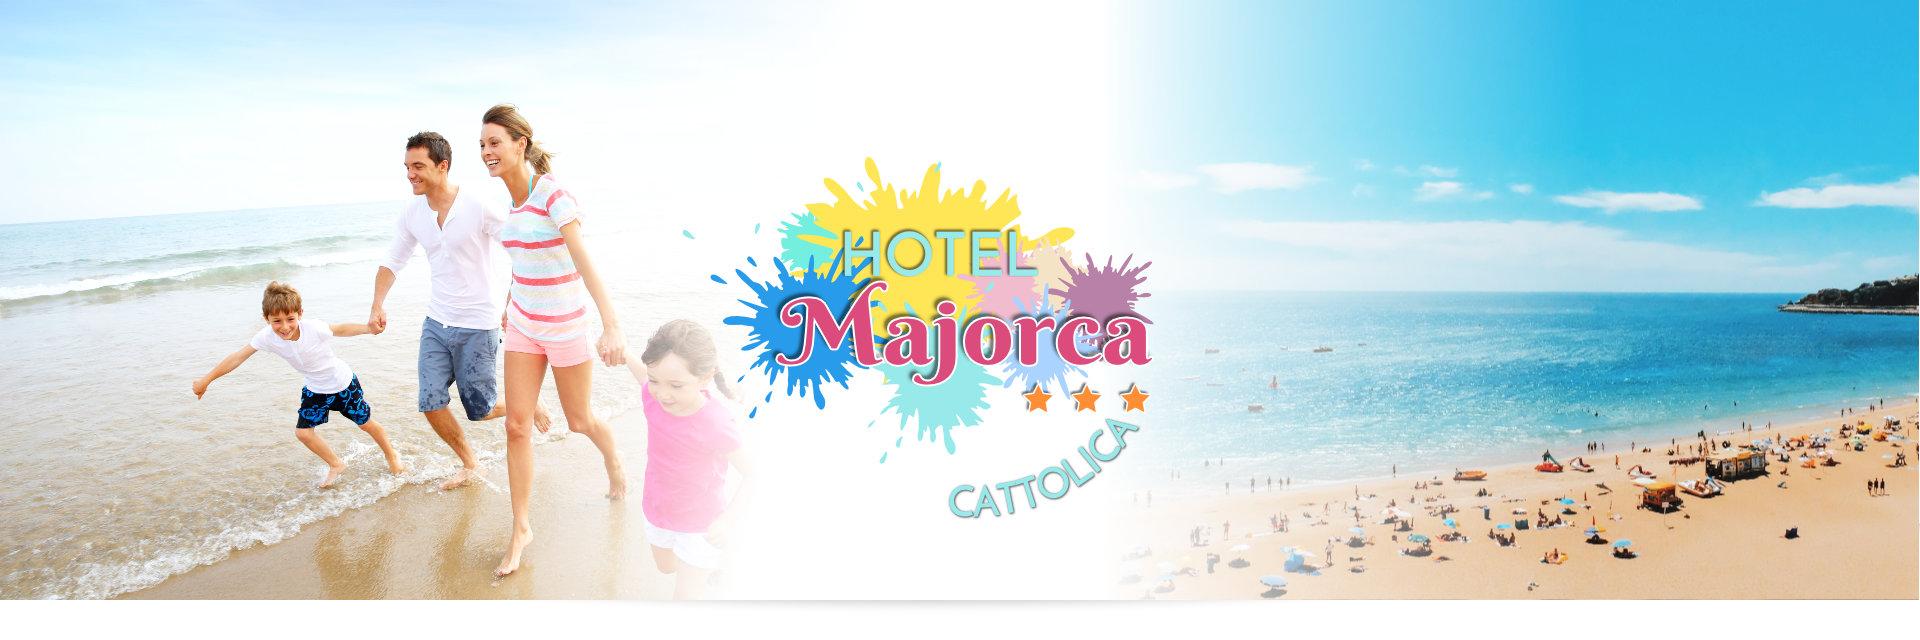 Offerte Vacanze Estive Hotel Majorca Cattolica